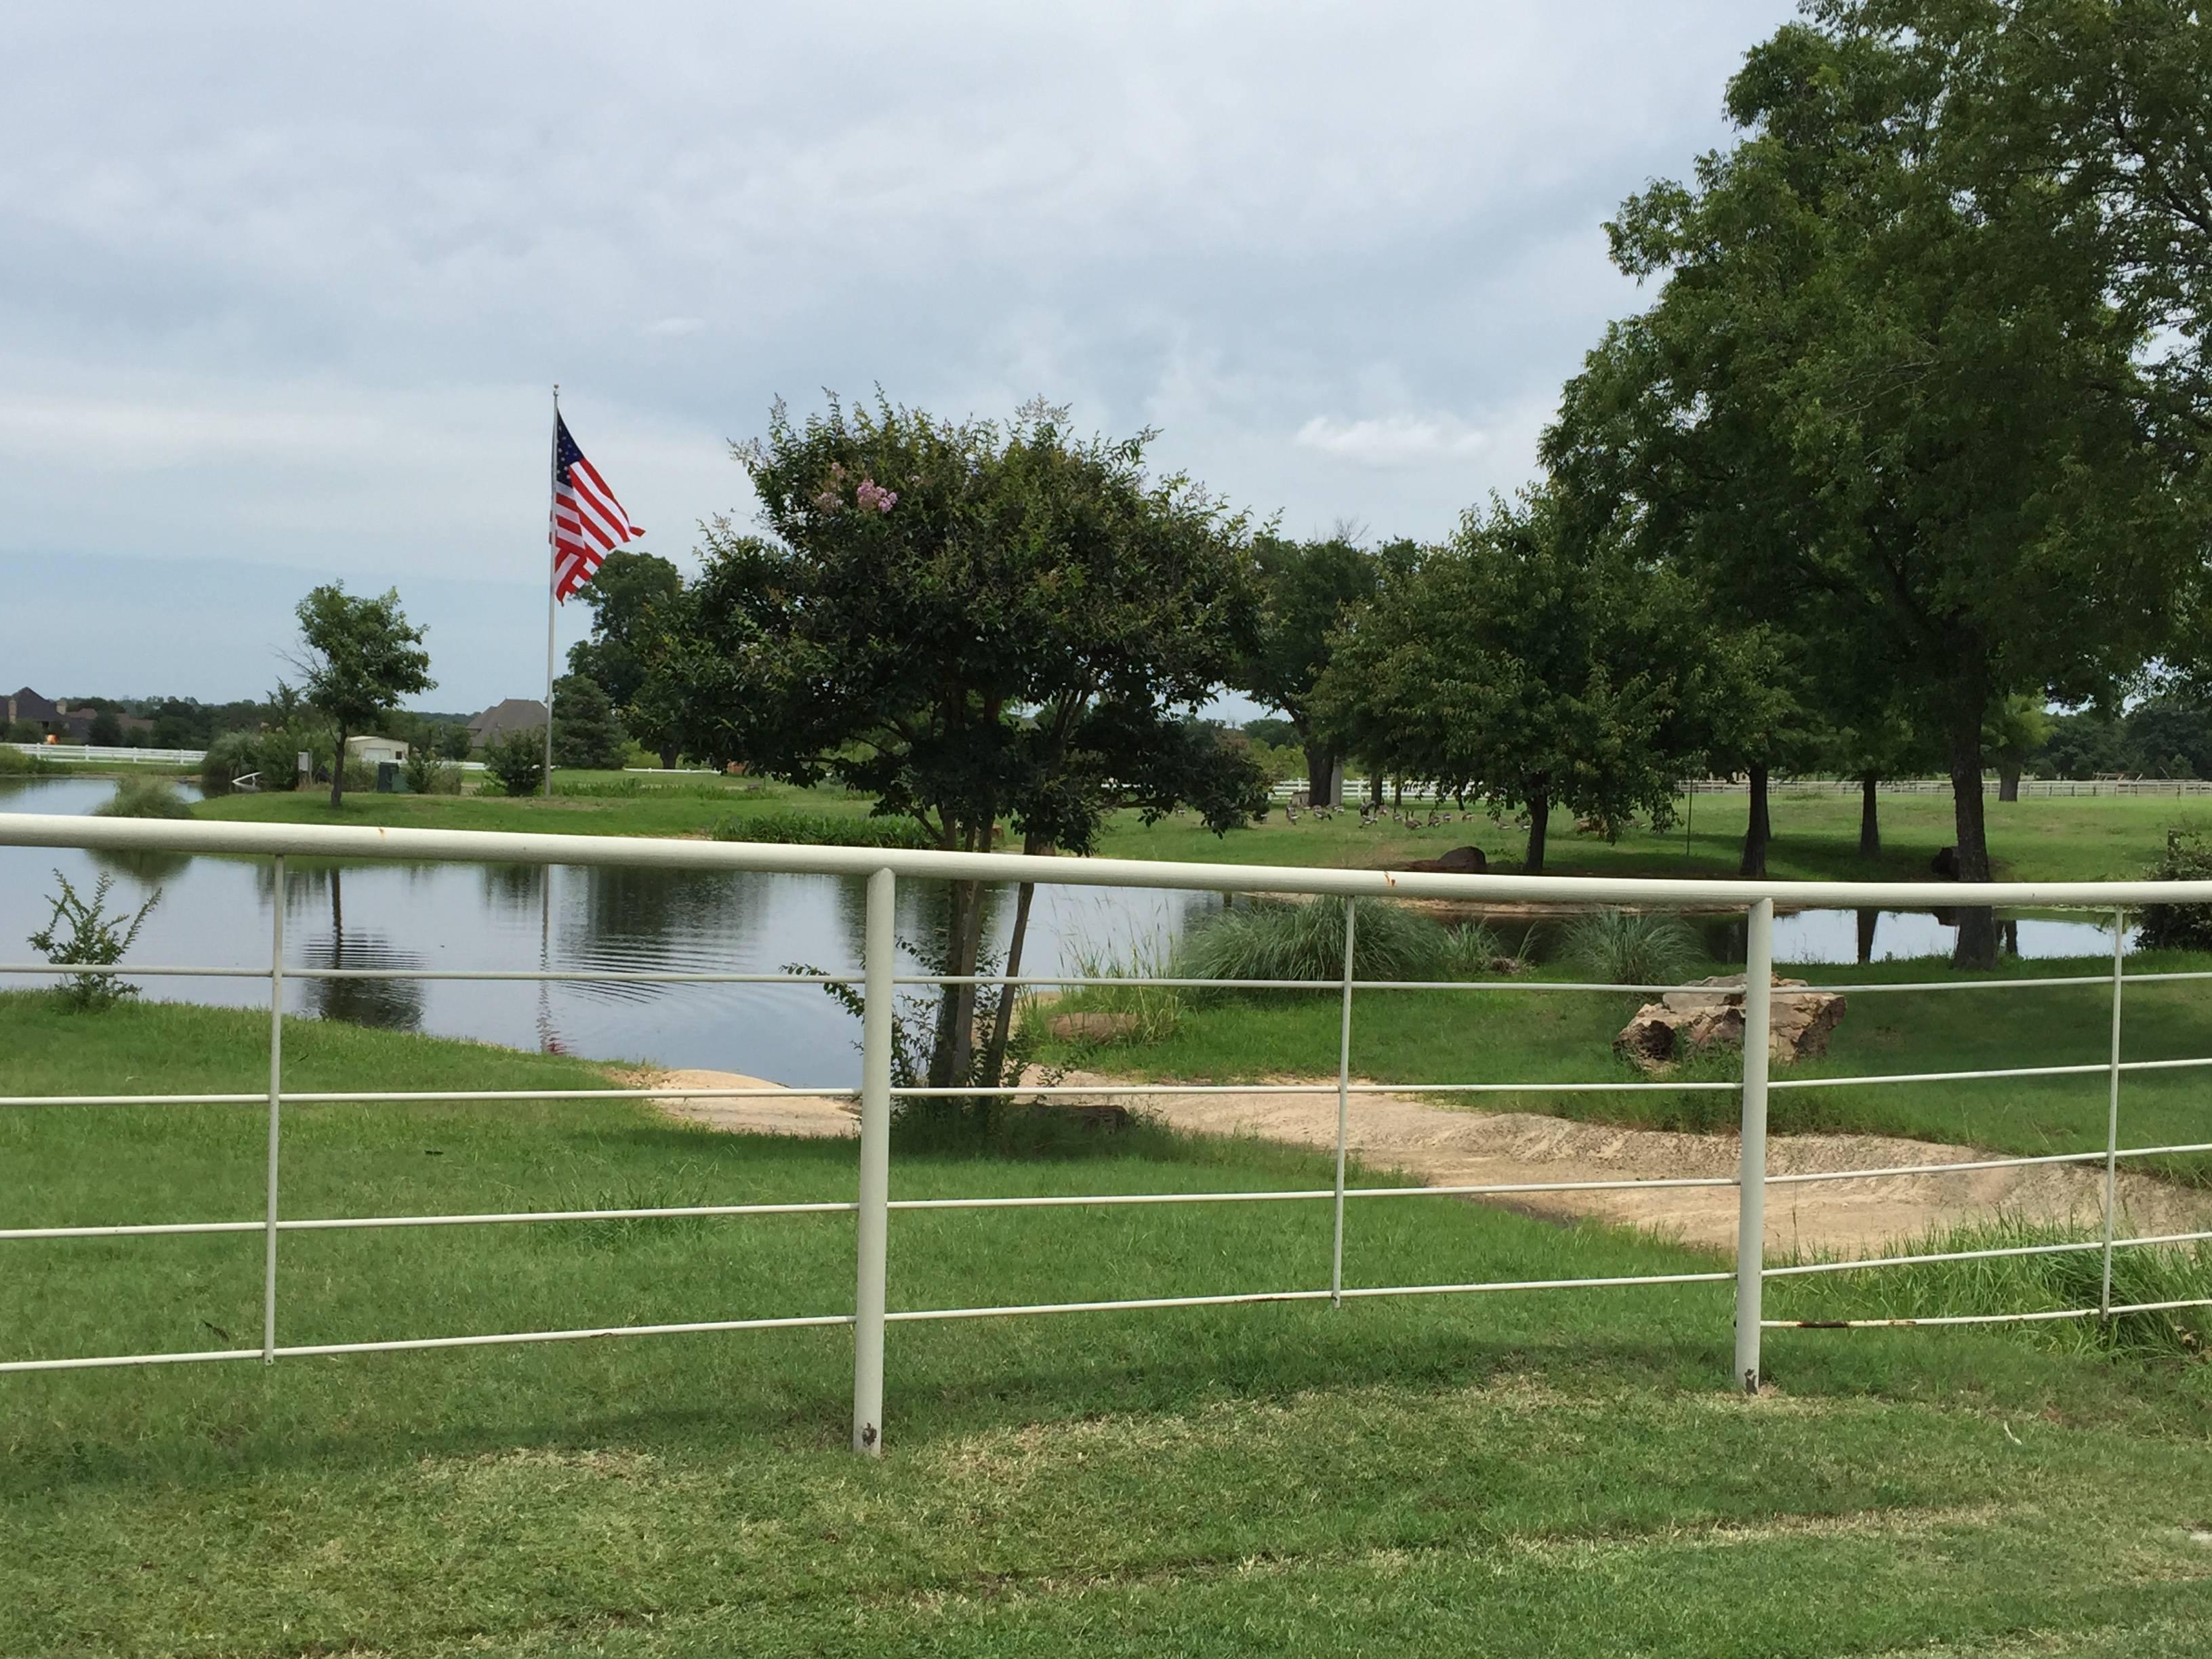 Pond at entrance to Roadrunner Rd Bartonville TX